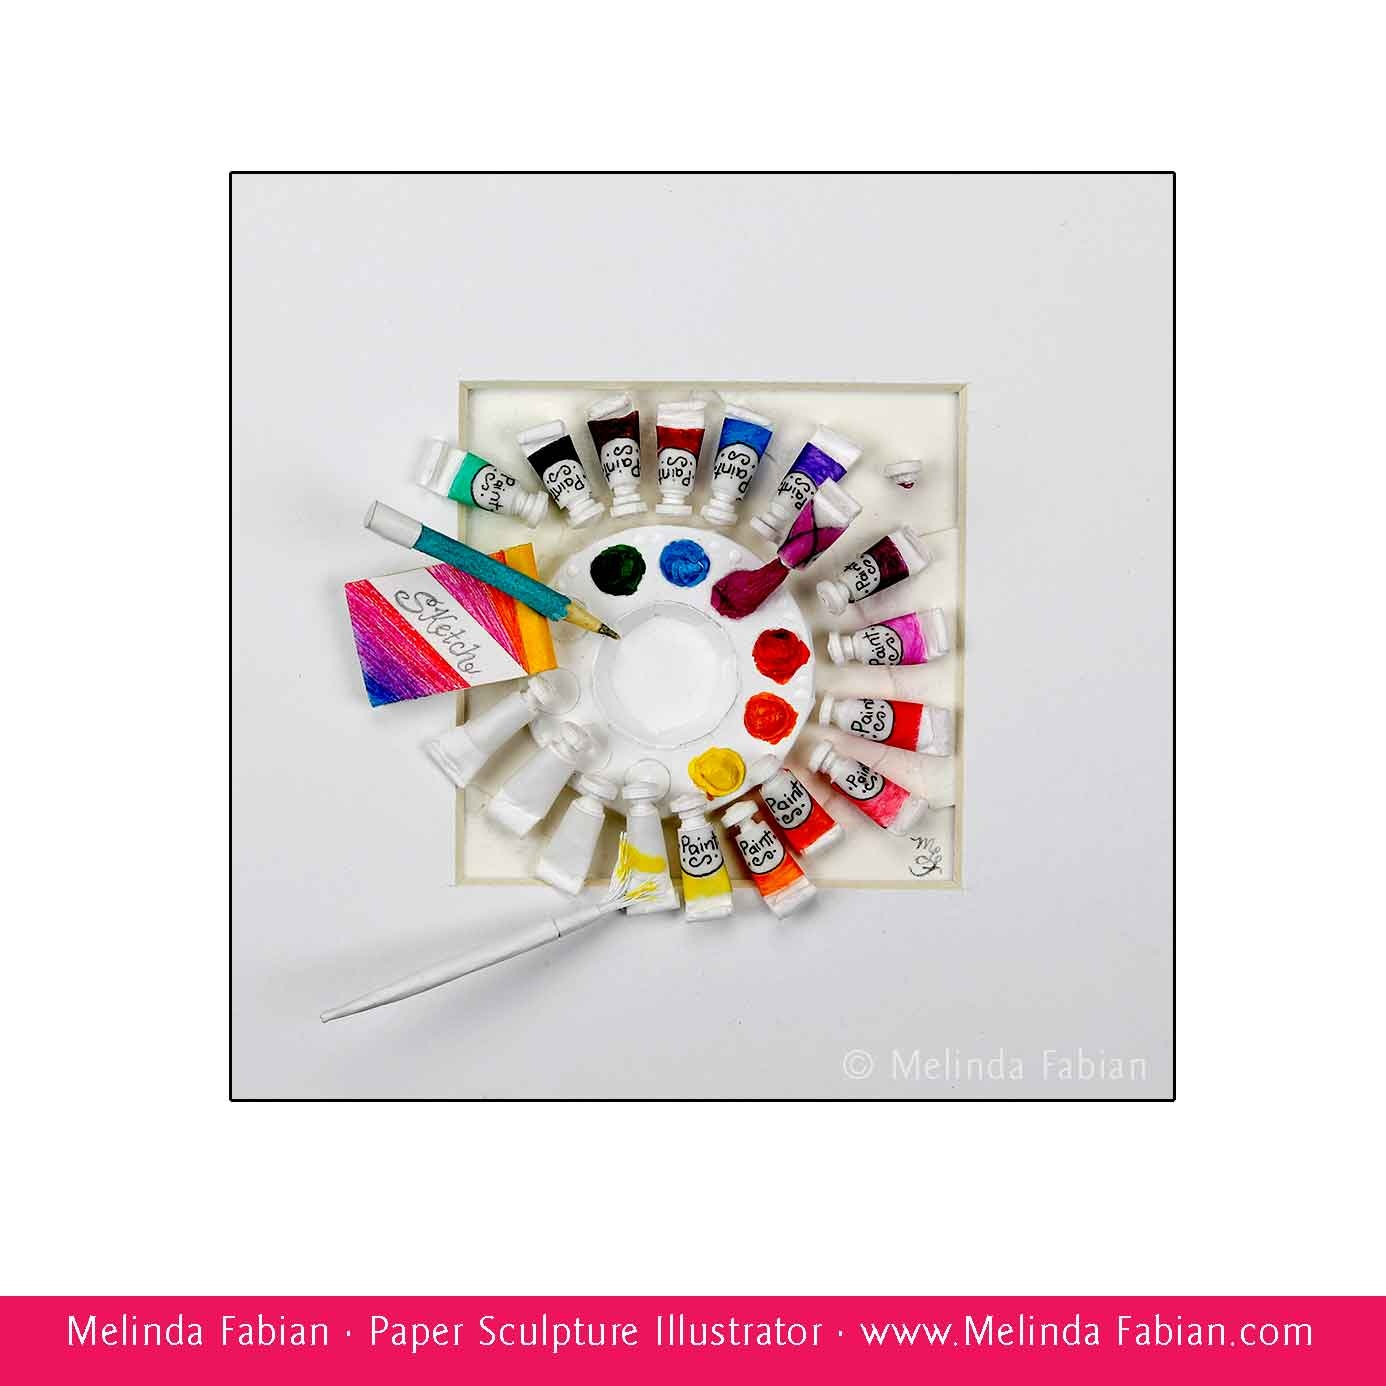 Color_Wheel_Melinda_Fabian.jpg